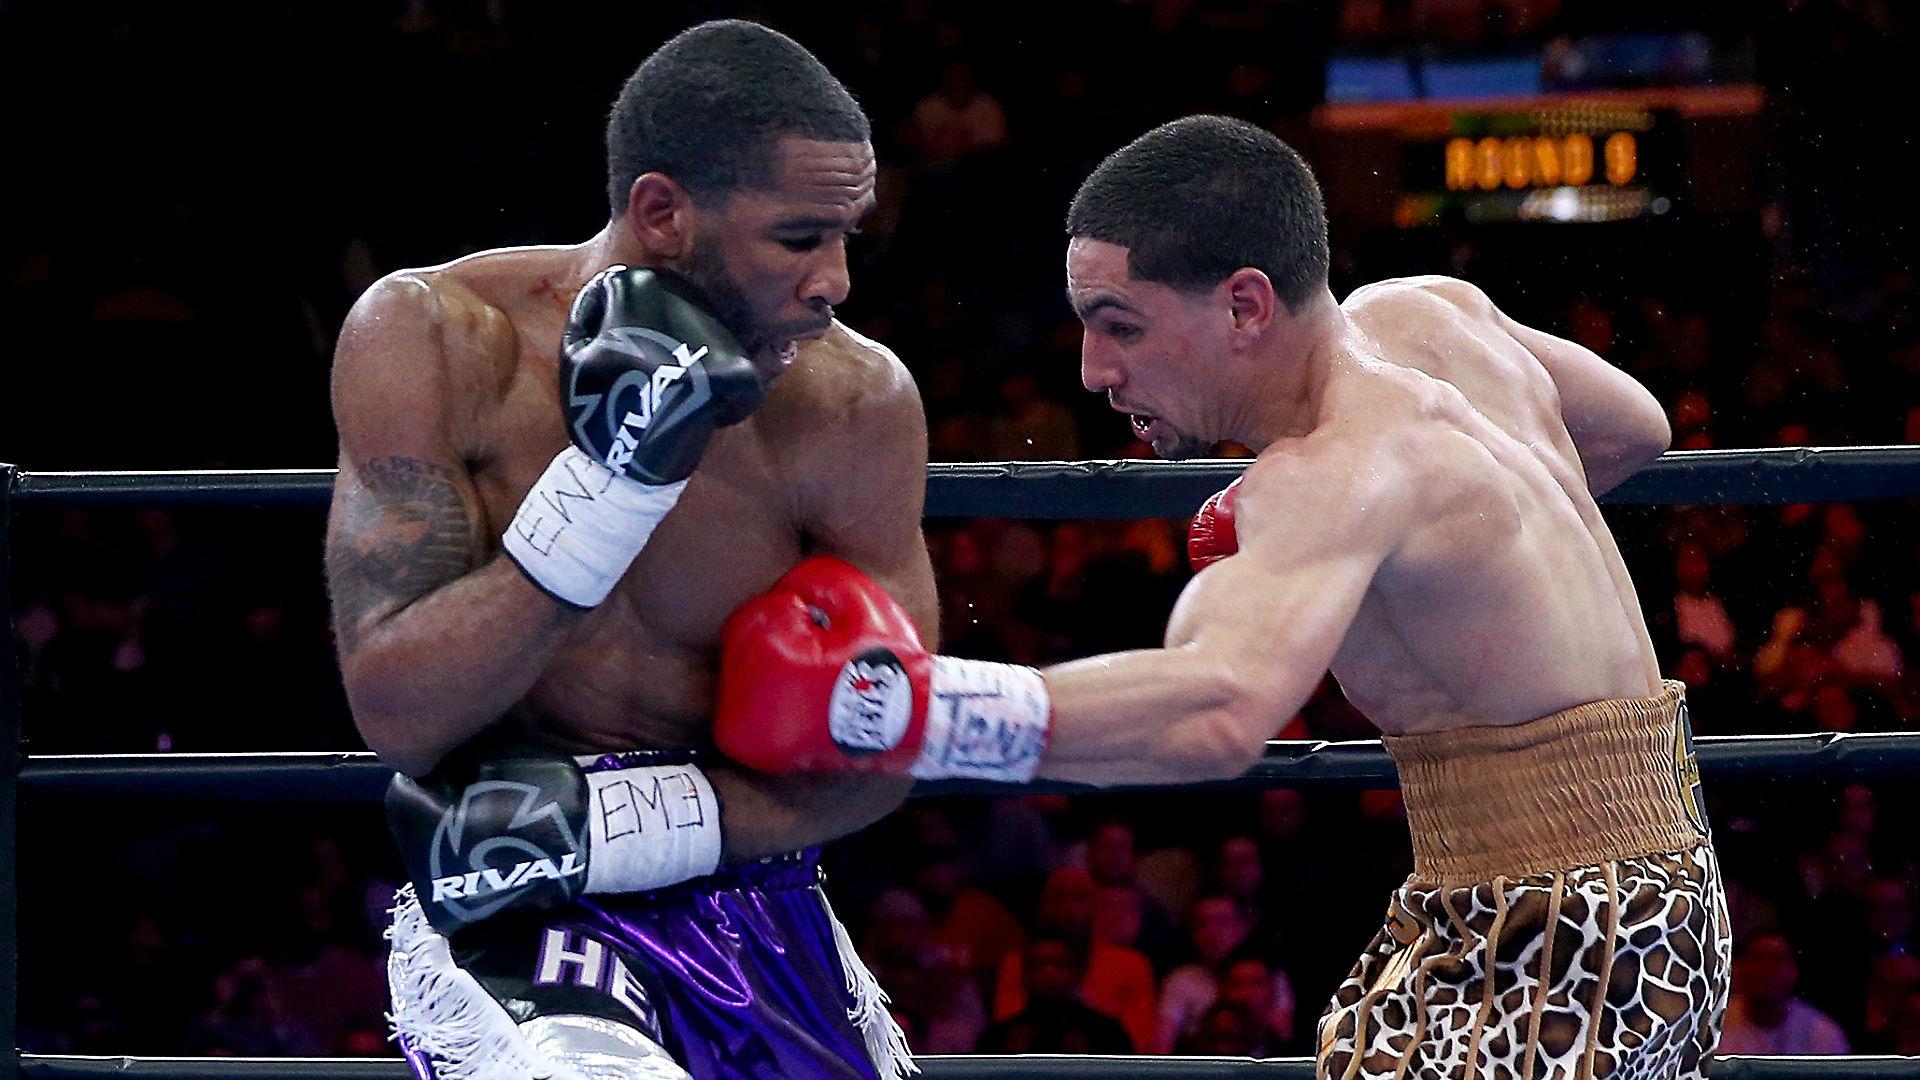 Garcia vs matthysse betting odds wsb boxing betting pool